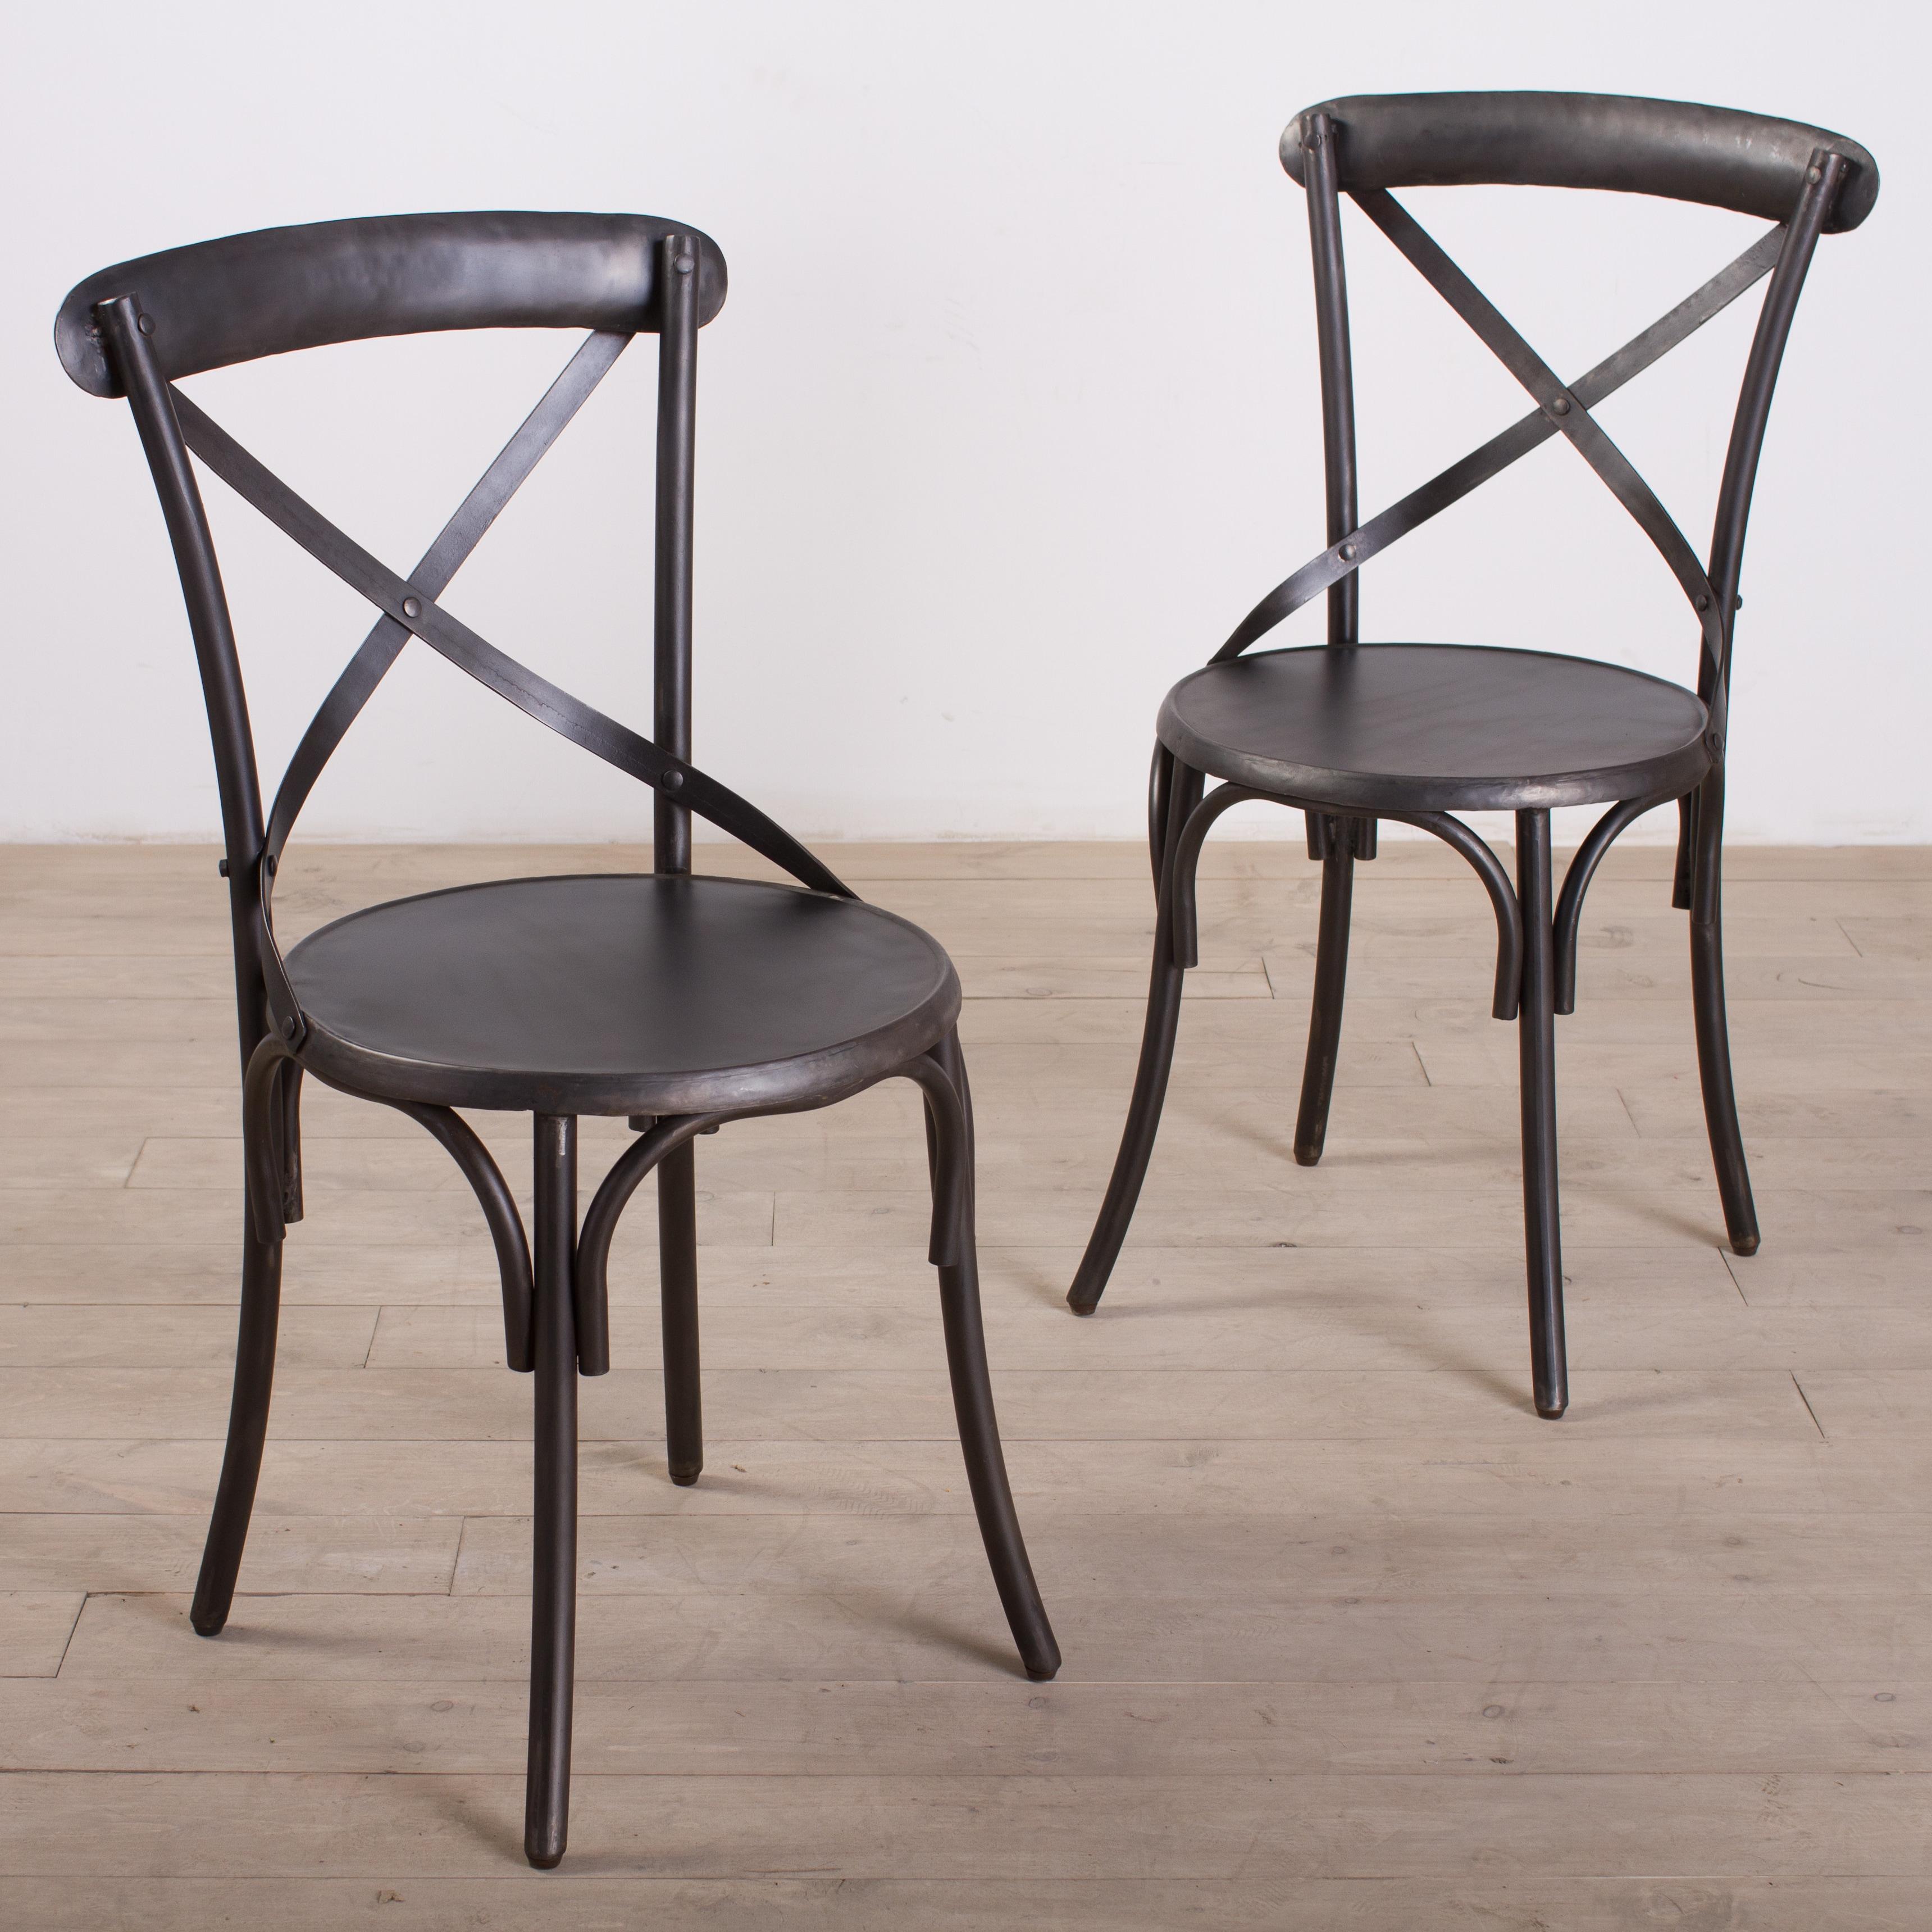 Metal Bistro Chairs Zinc Finish Set Of 2 Overstock